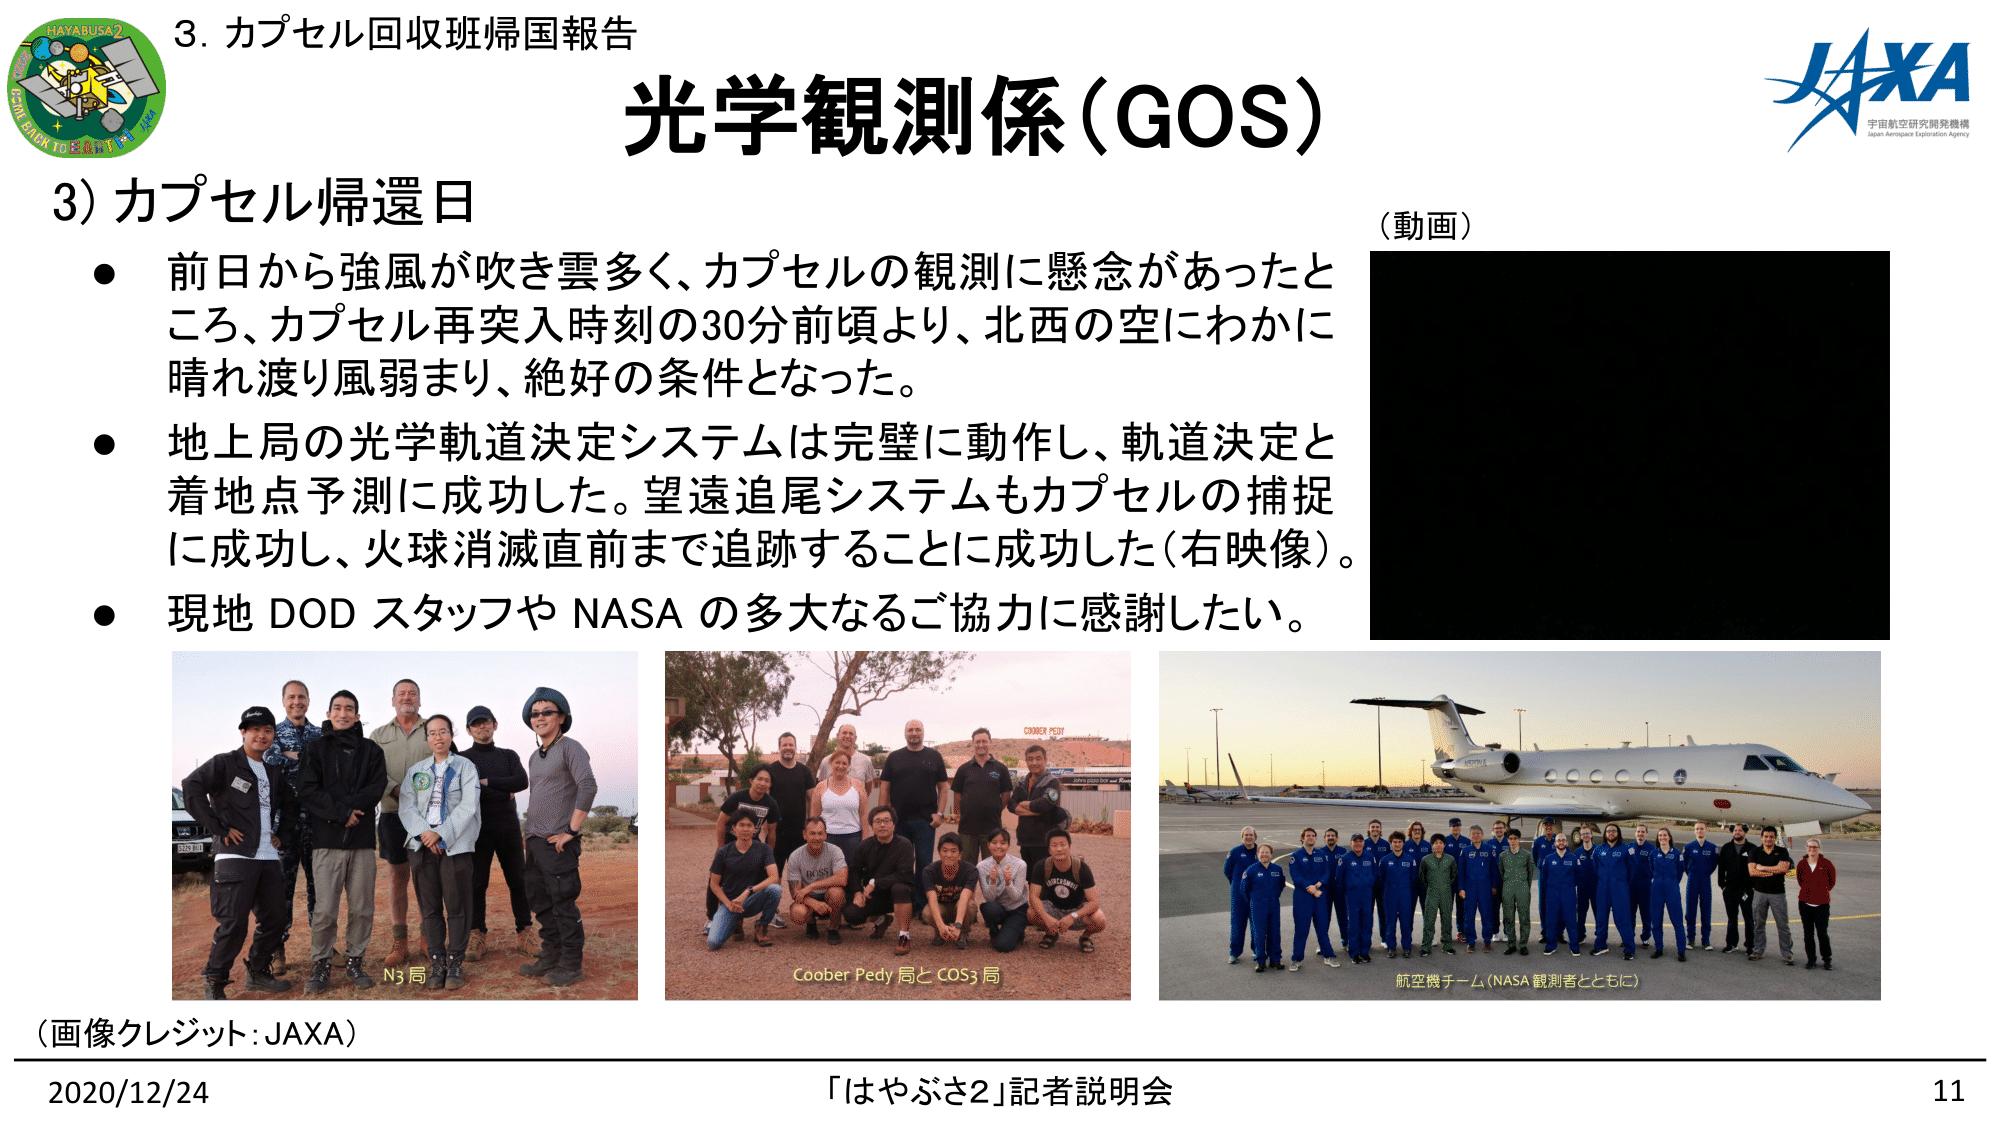 f:id:Imamura:20201224135058p:plain